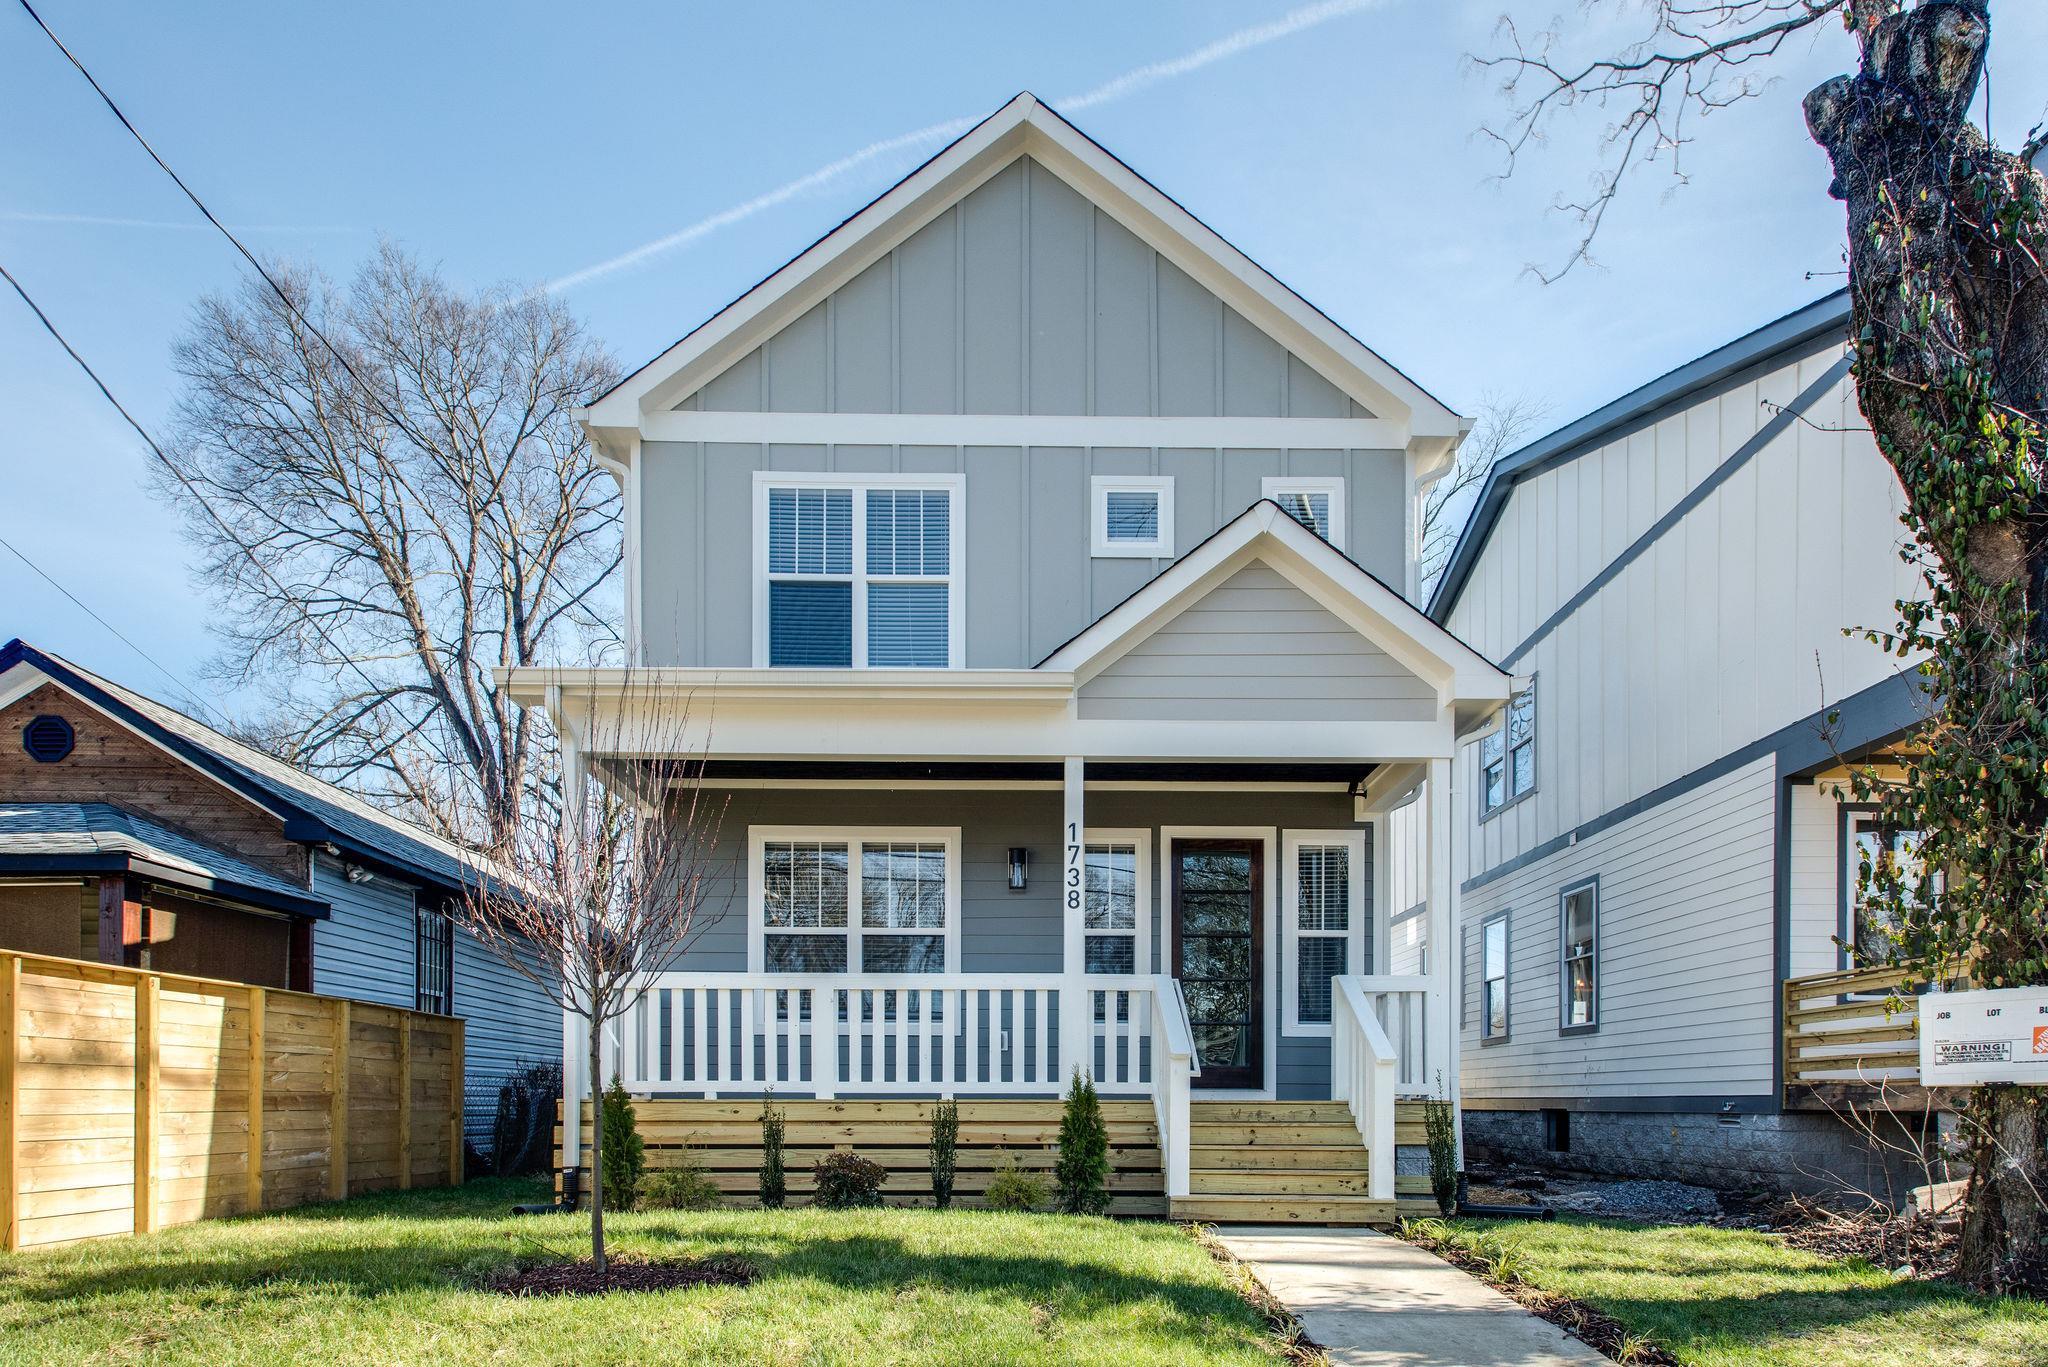 2100 15th Ave N A, Nashville, TN 37208 - Nashville, TN real estate listing